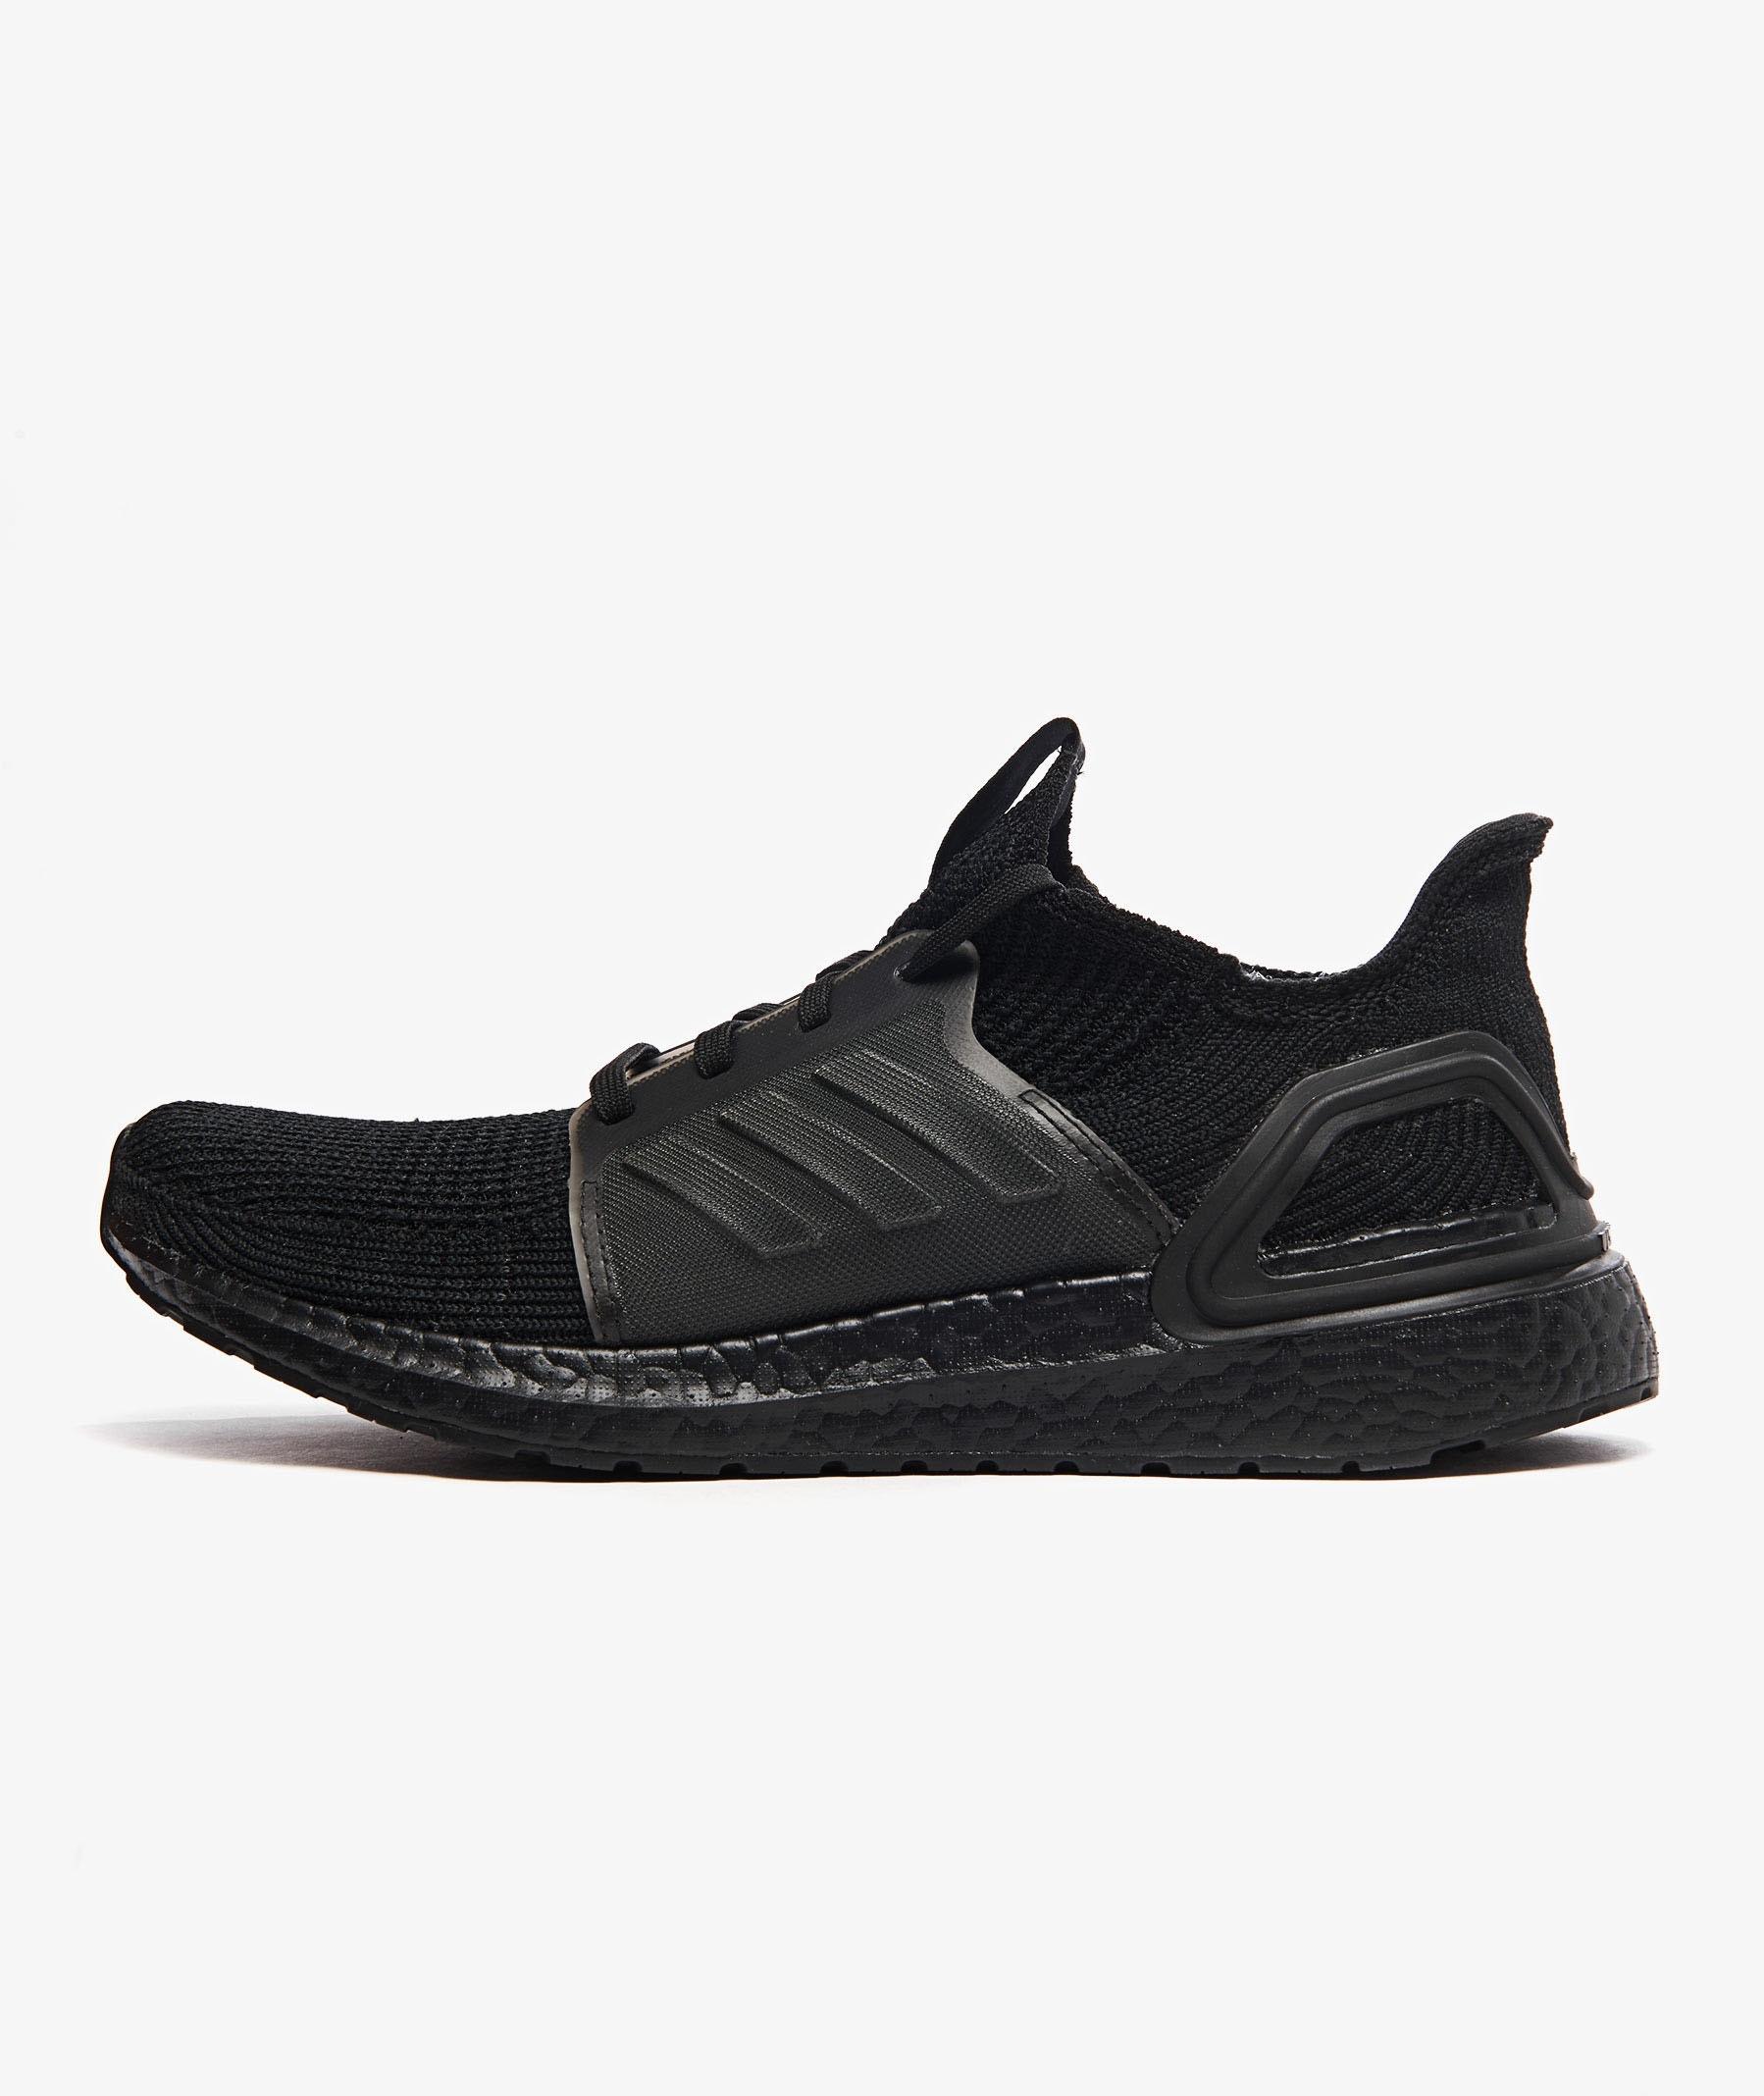 adidas UltraBOOST 19 m G27508 Black